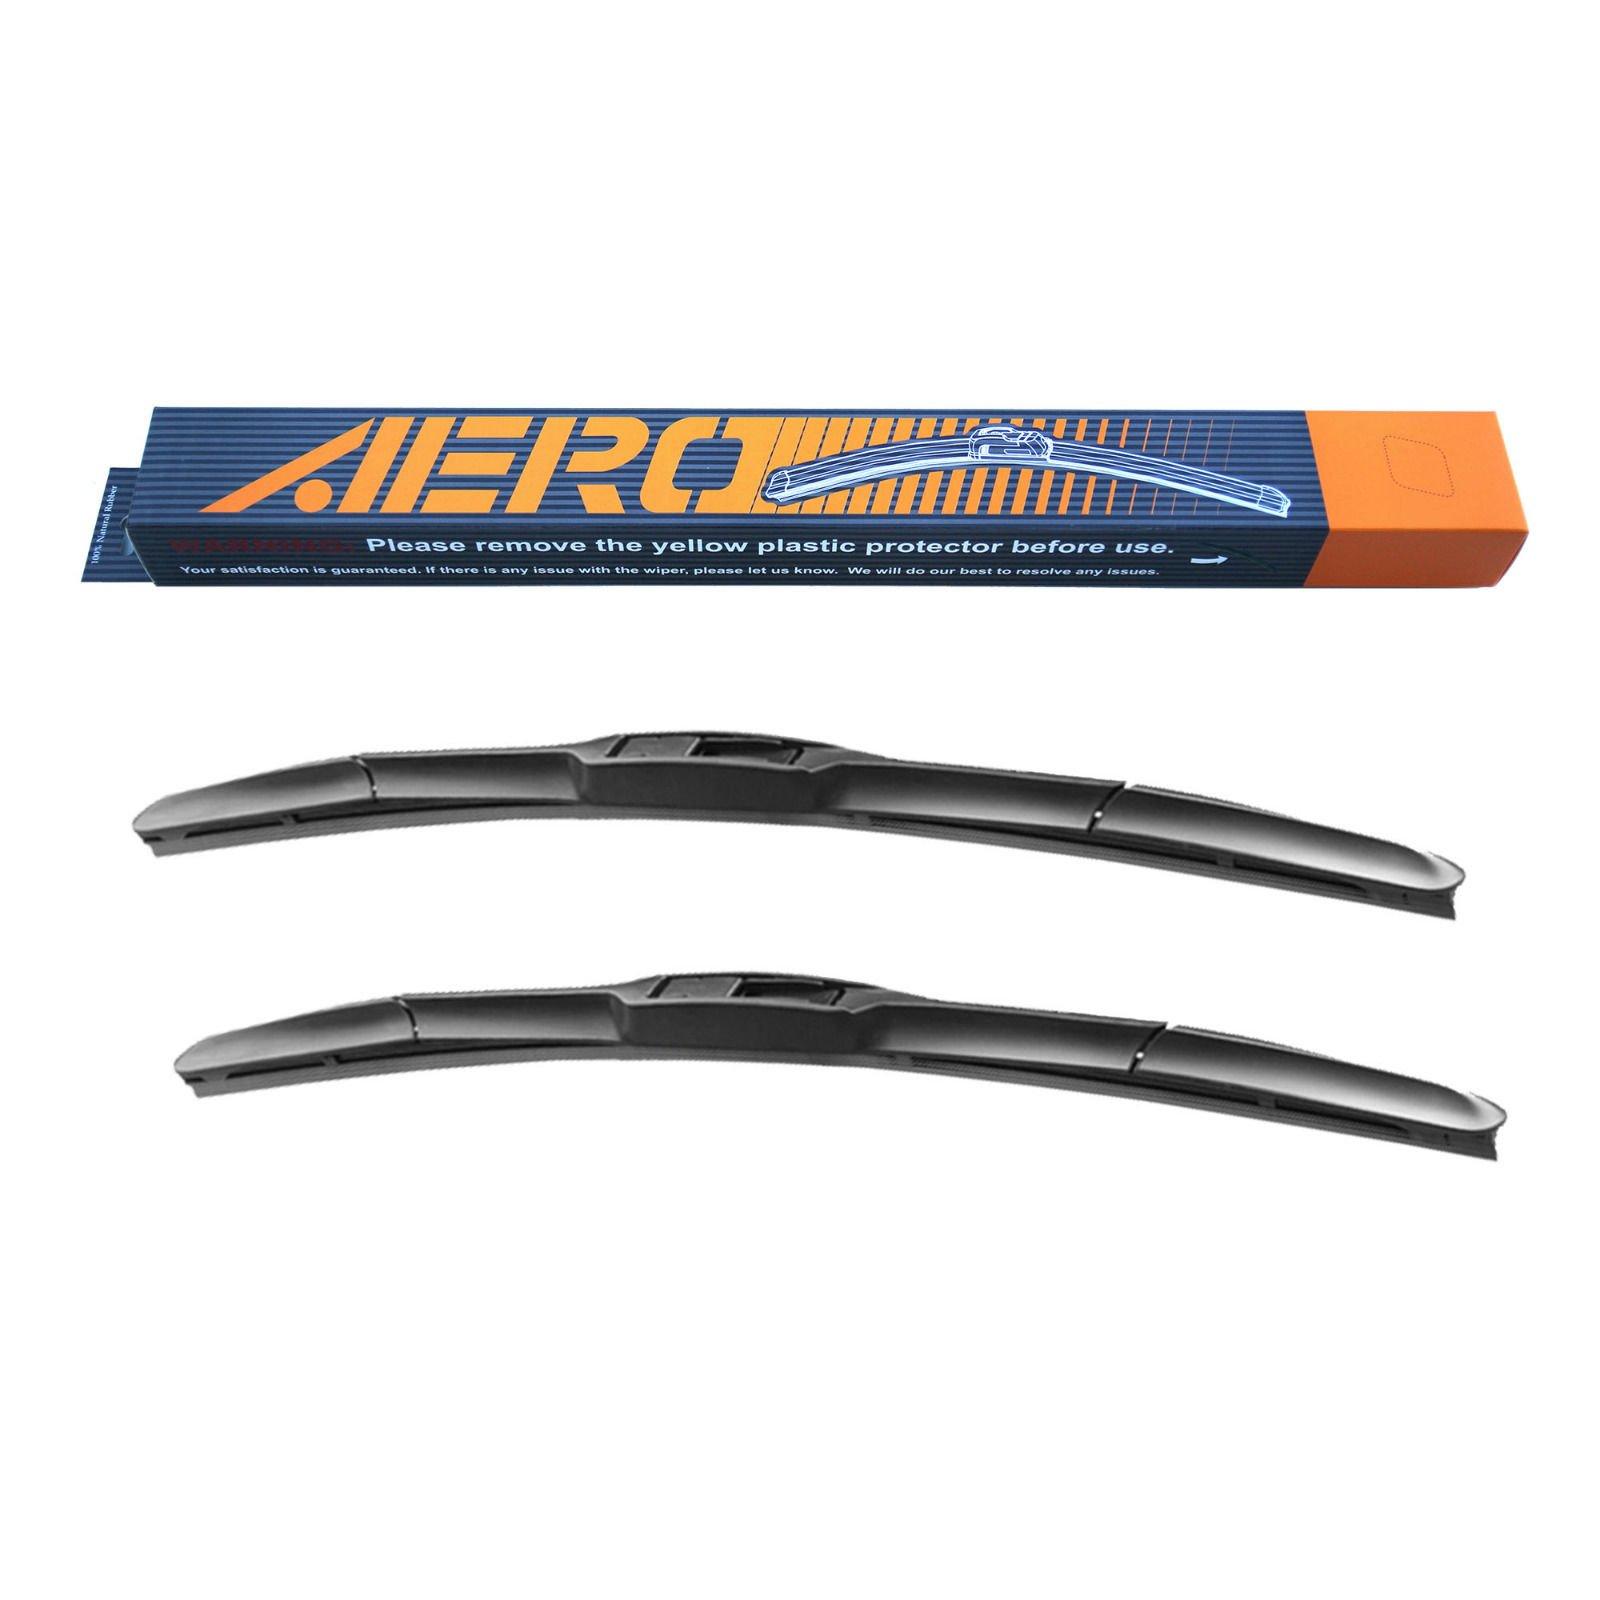 AERO Hybrid 21'' + 21'' Premium Quality All-Season Windshield Wiper Blades (Set of 2)